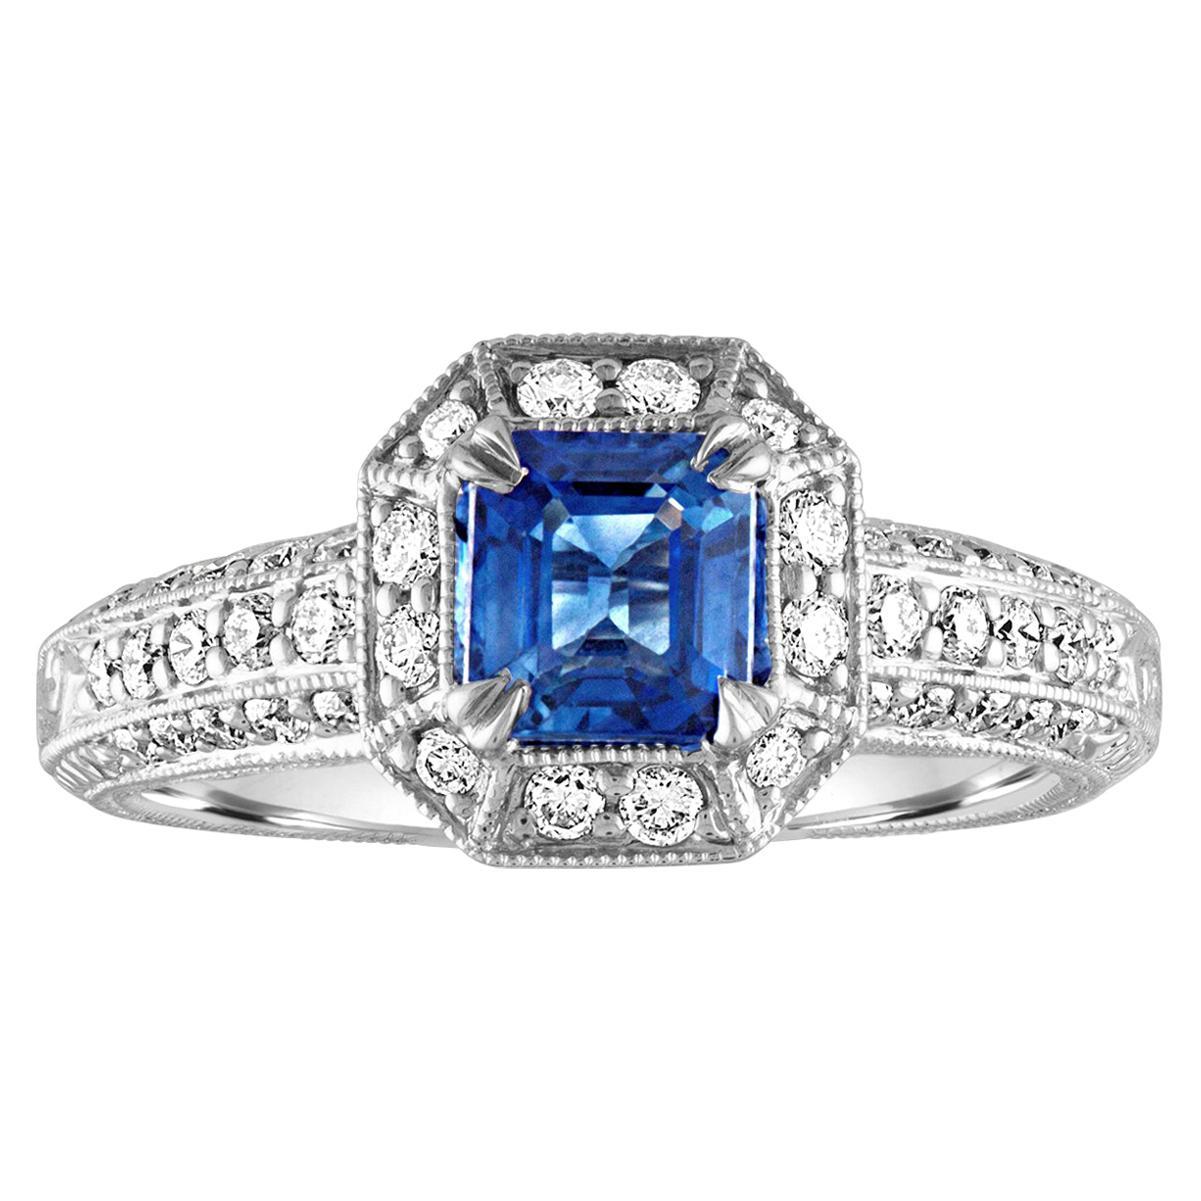 1.24 Carat Blue Sapphire Diamond Gold Milgrain Filigree Ring